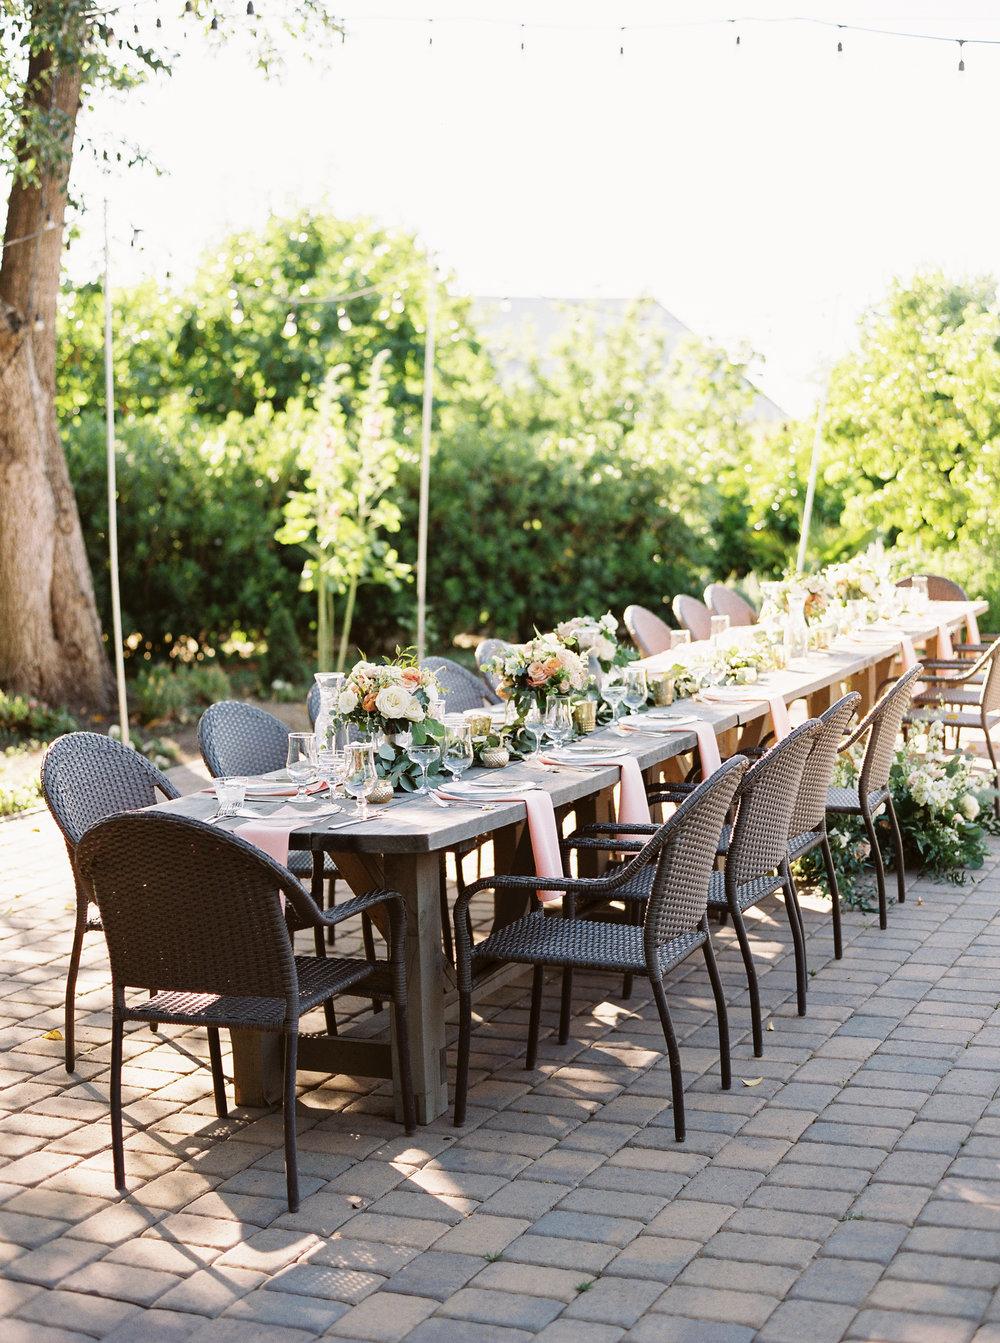 Durst-winery-wedding-in-lodi-calfornia-151.jpg